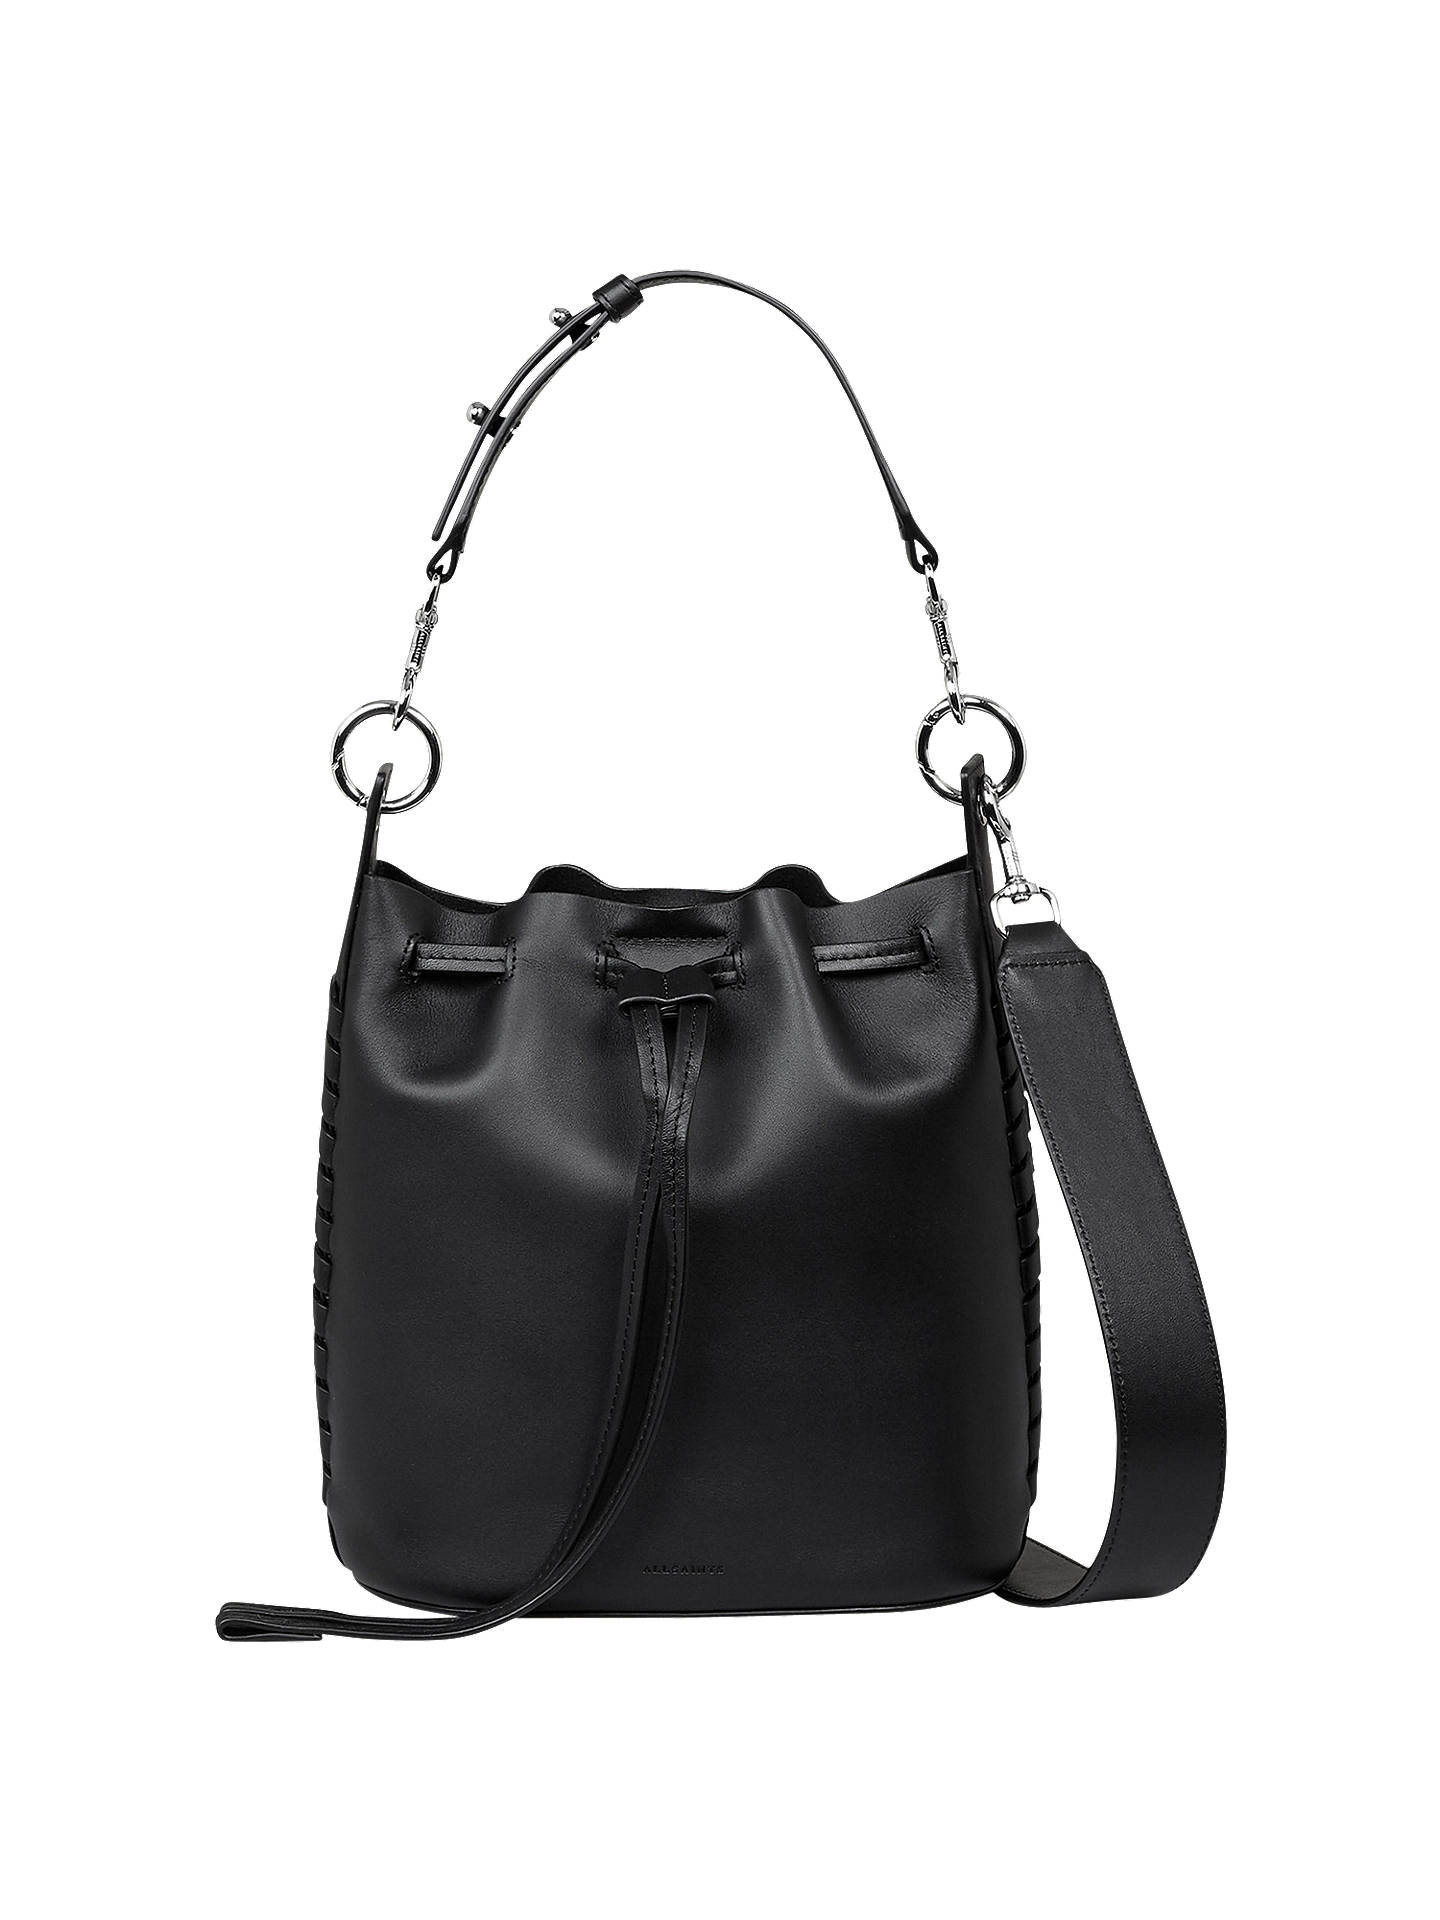 6c99537dbcfa BuyAllSaints Ray Leather Small Bucket Bag